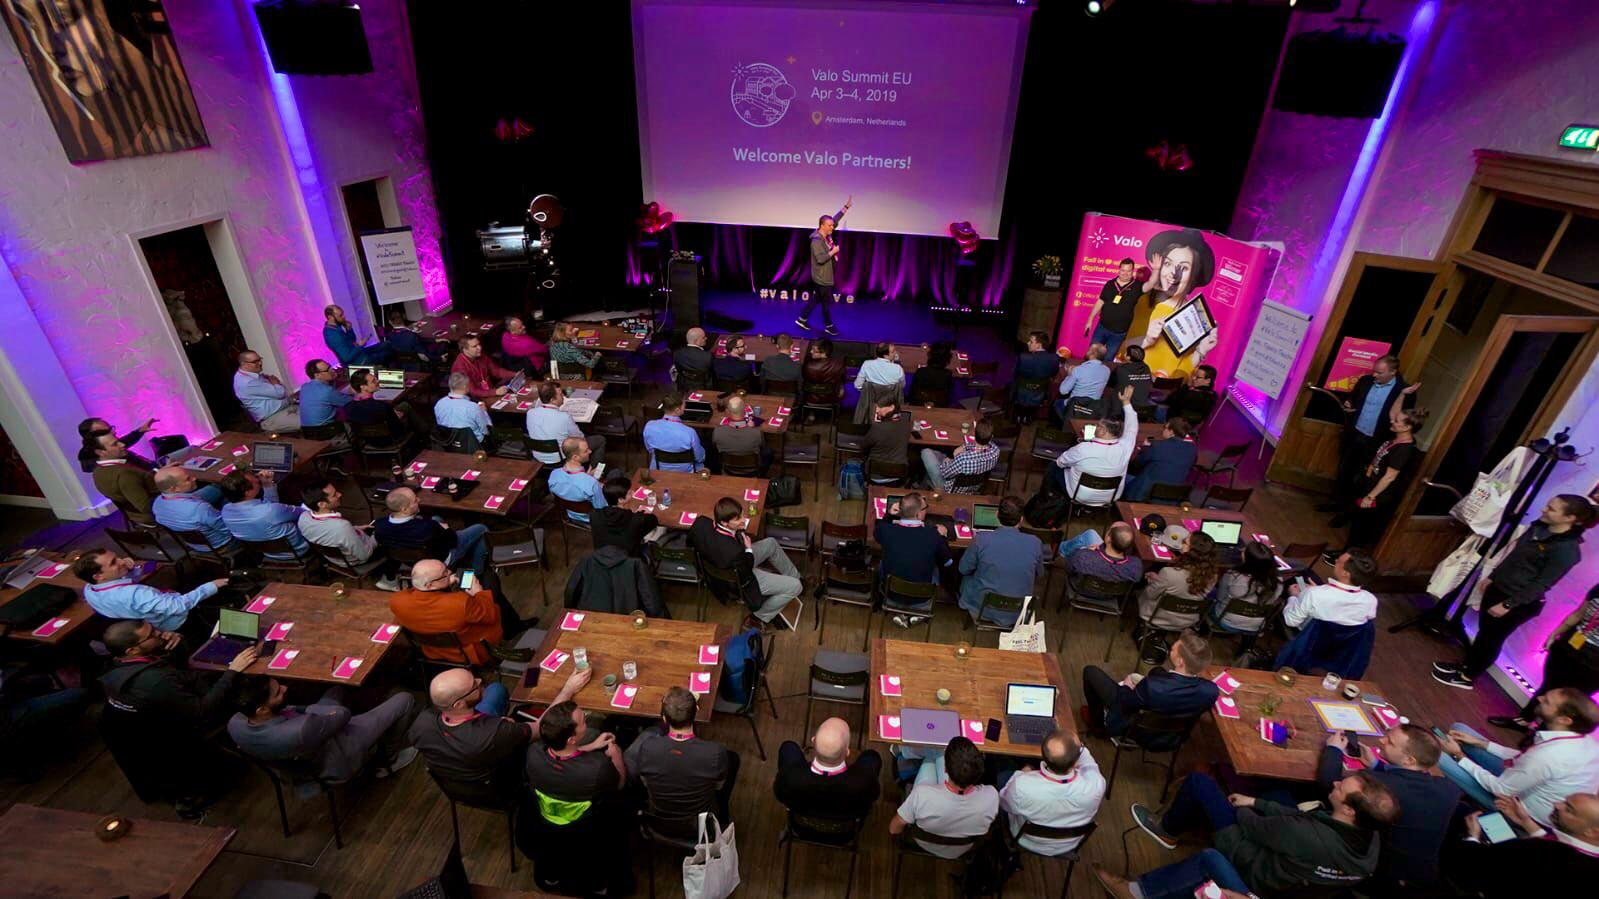 Valo Digital Workplace Summit Amsterdam 2019